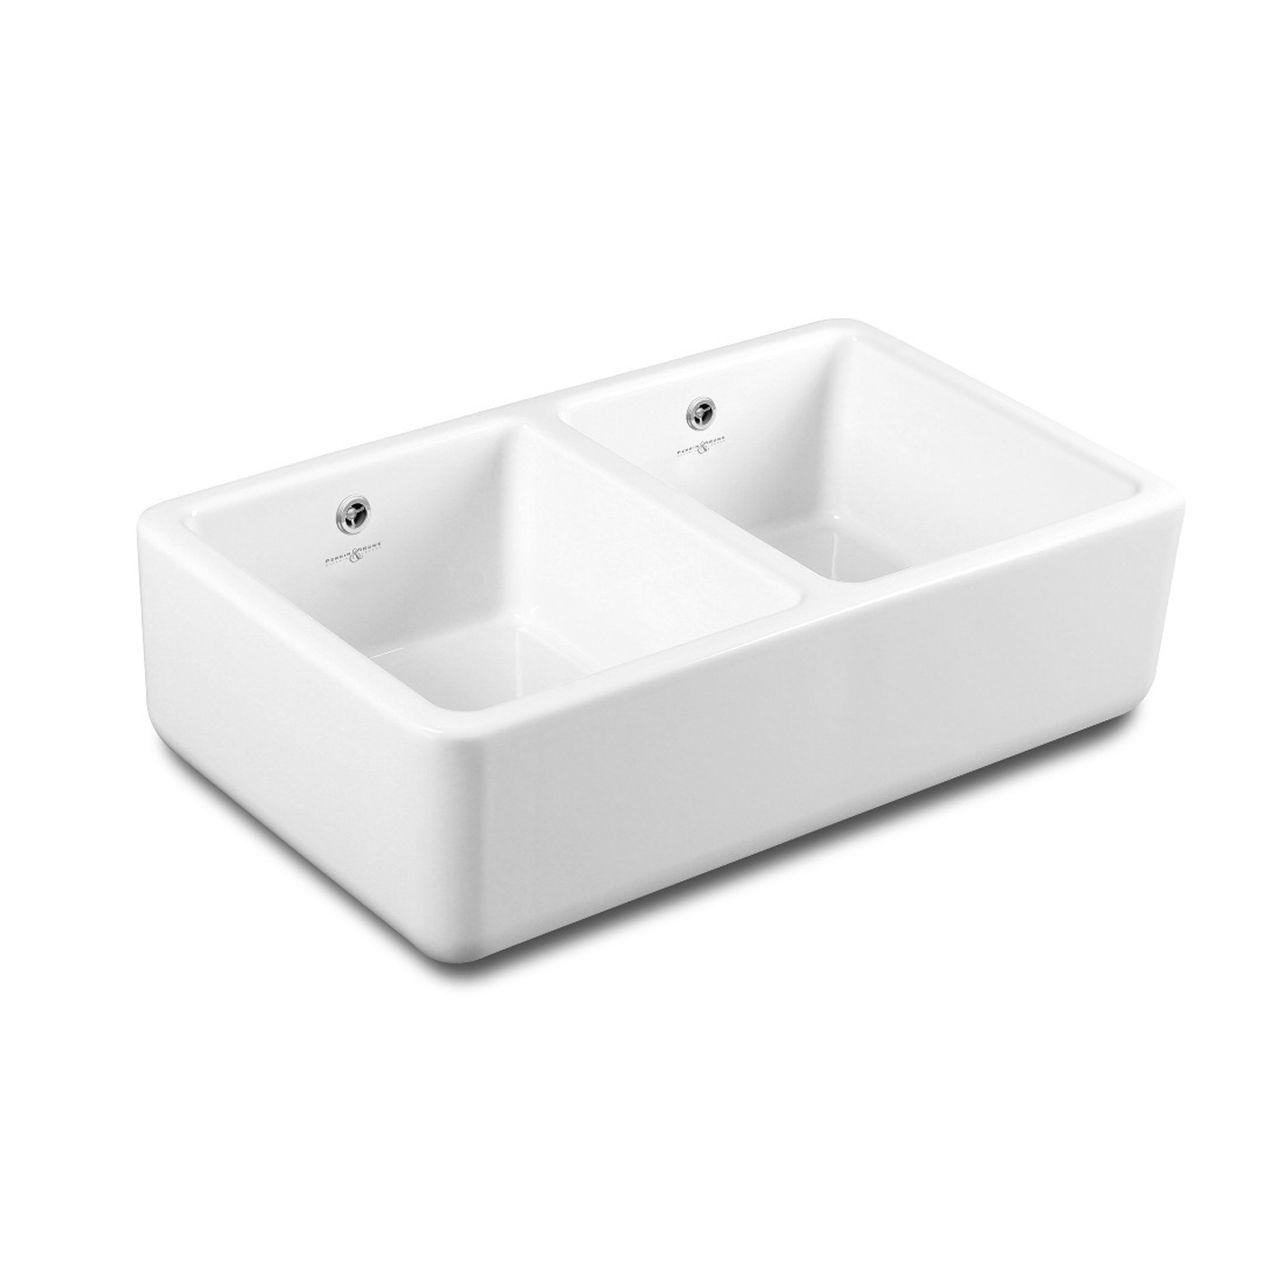 Lavello In Ceramica Da Cucina lavello a 2 vasche - 2475 - perrin & rowe - in ceramica / a